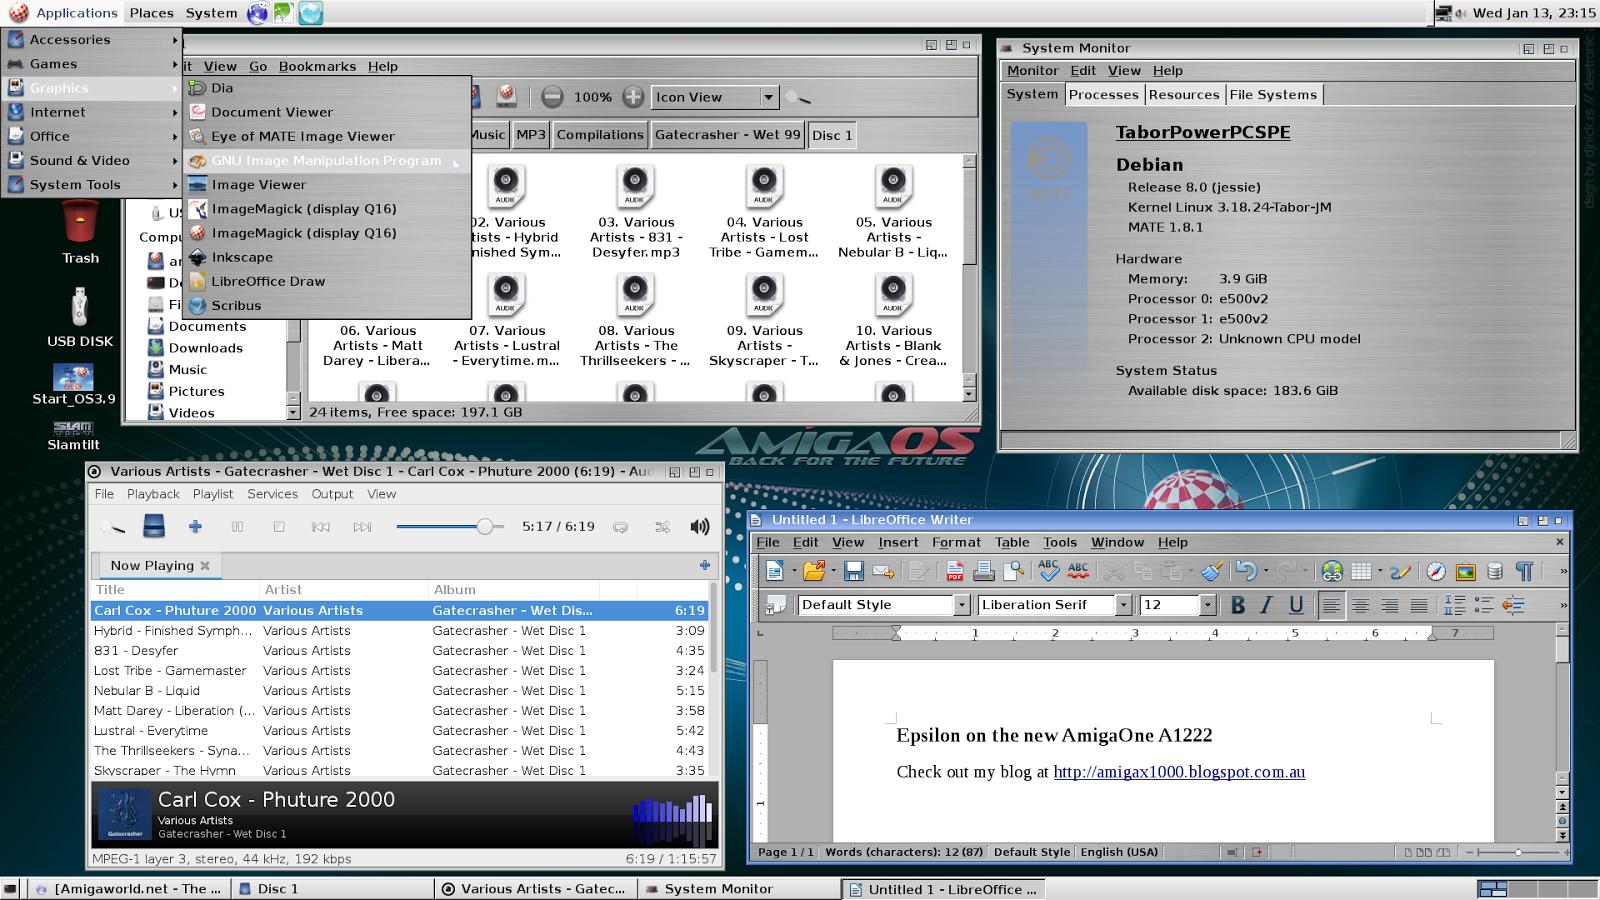 Epsilon's Amiga Blog: Debian Linux on AmigaOne A1222